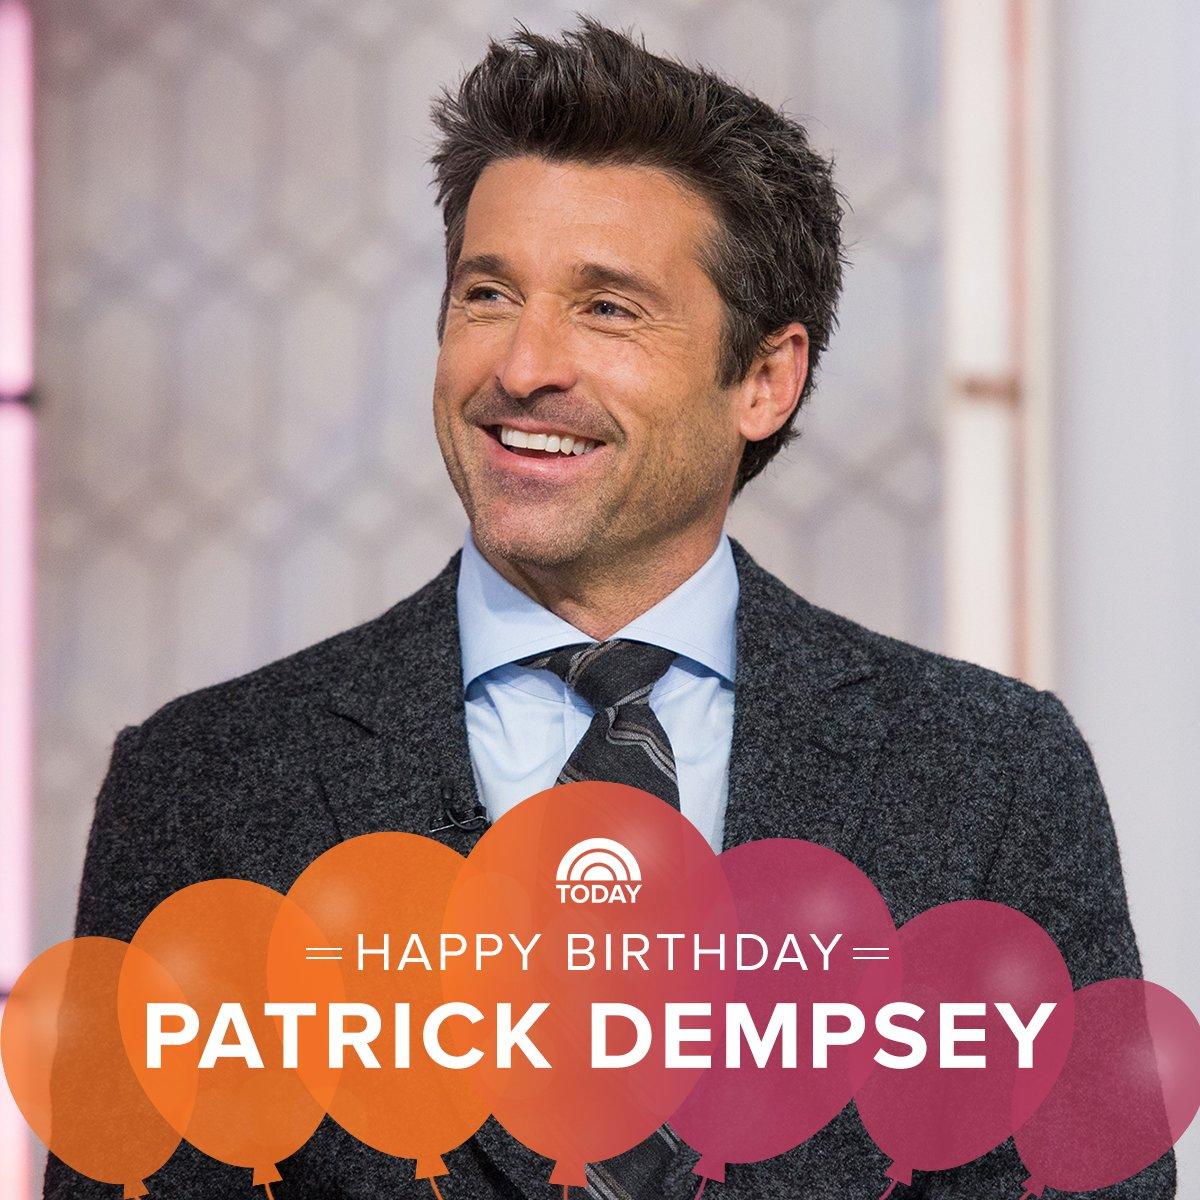 Happy birthday to the dreamy Patrick Dempsey!